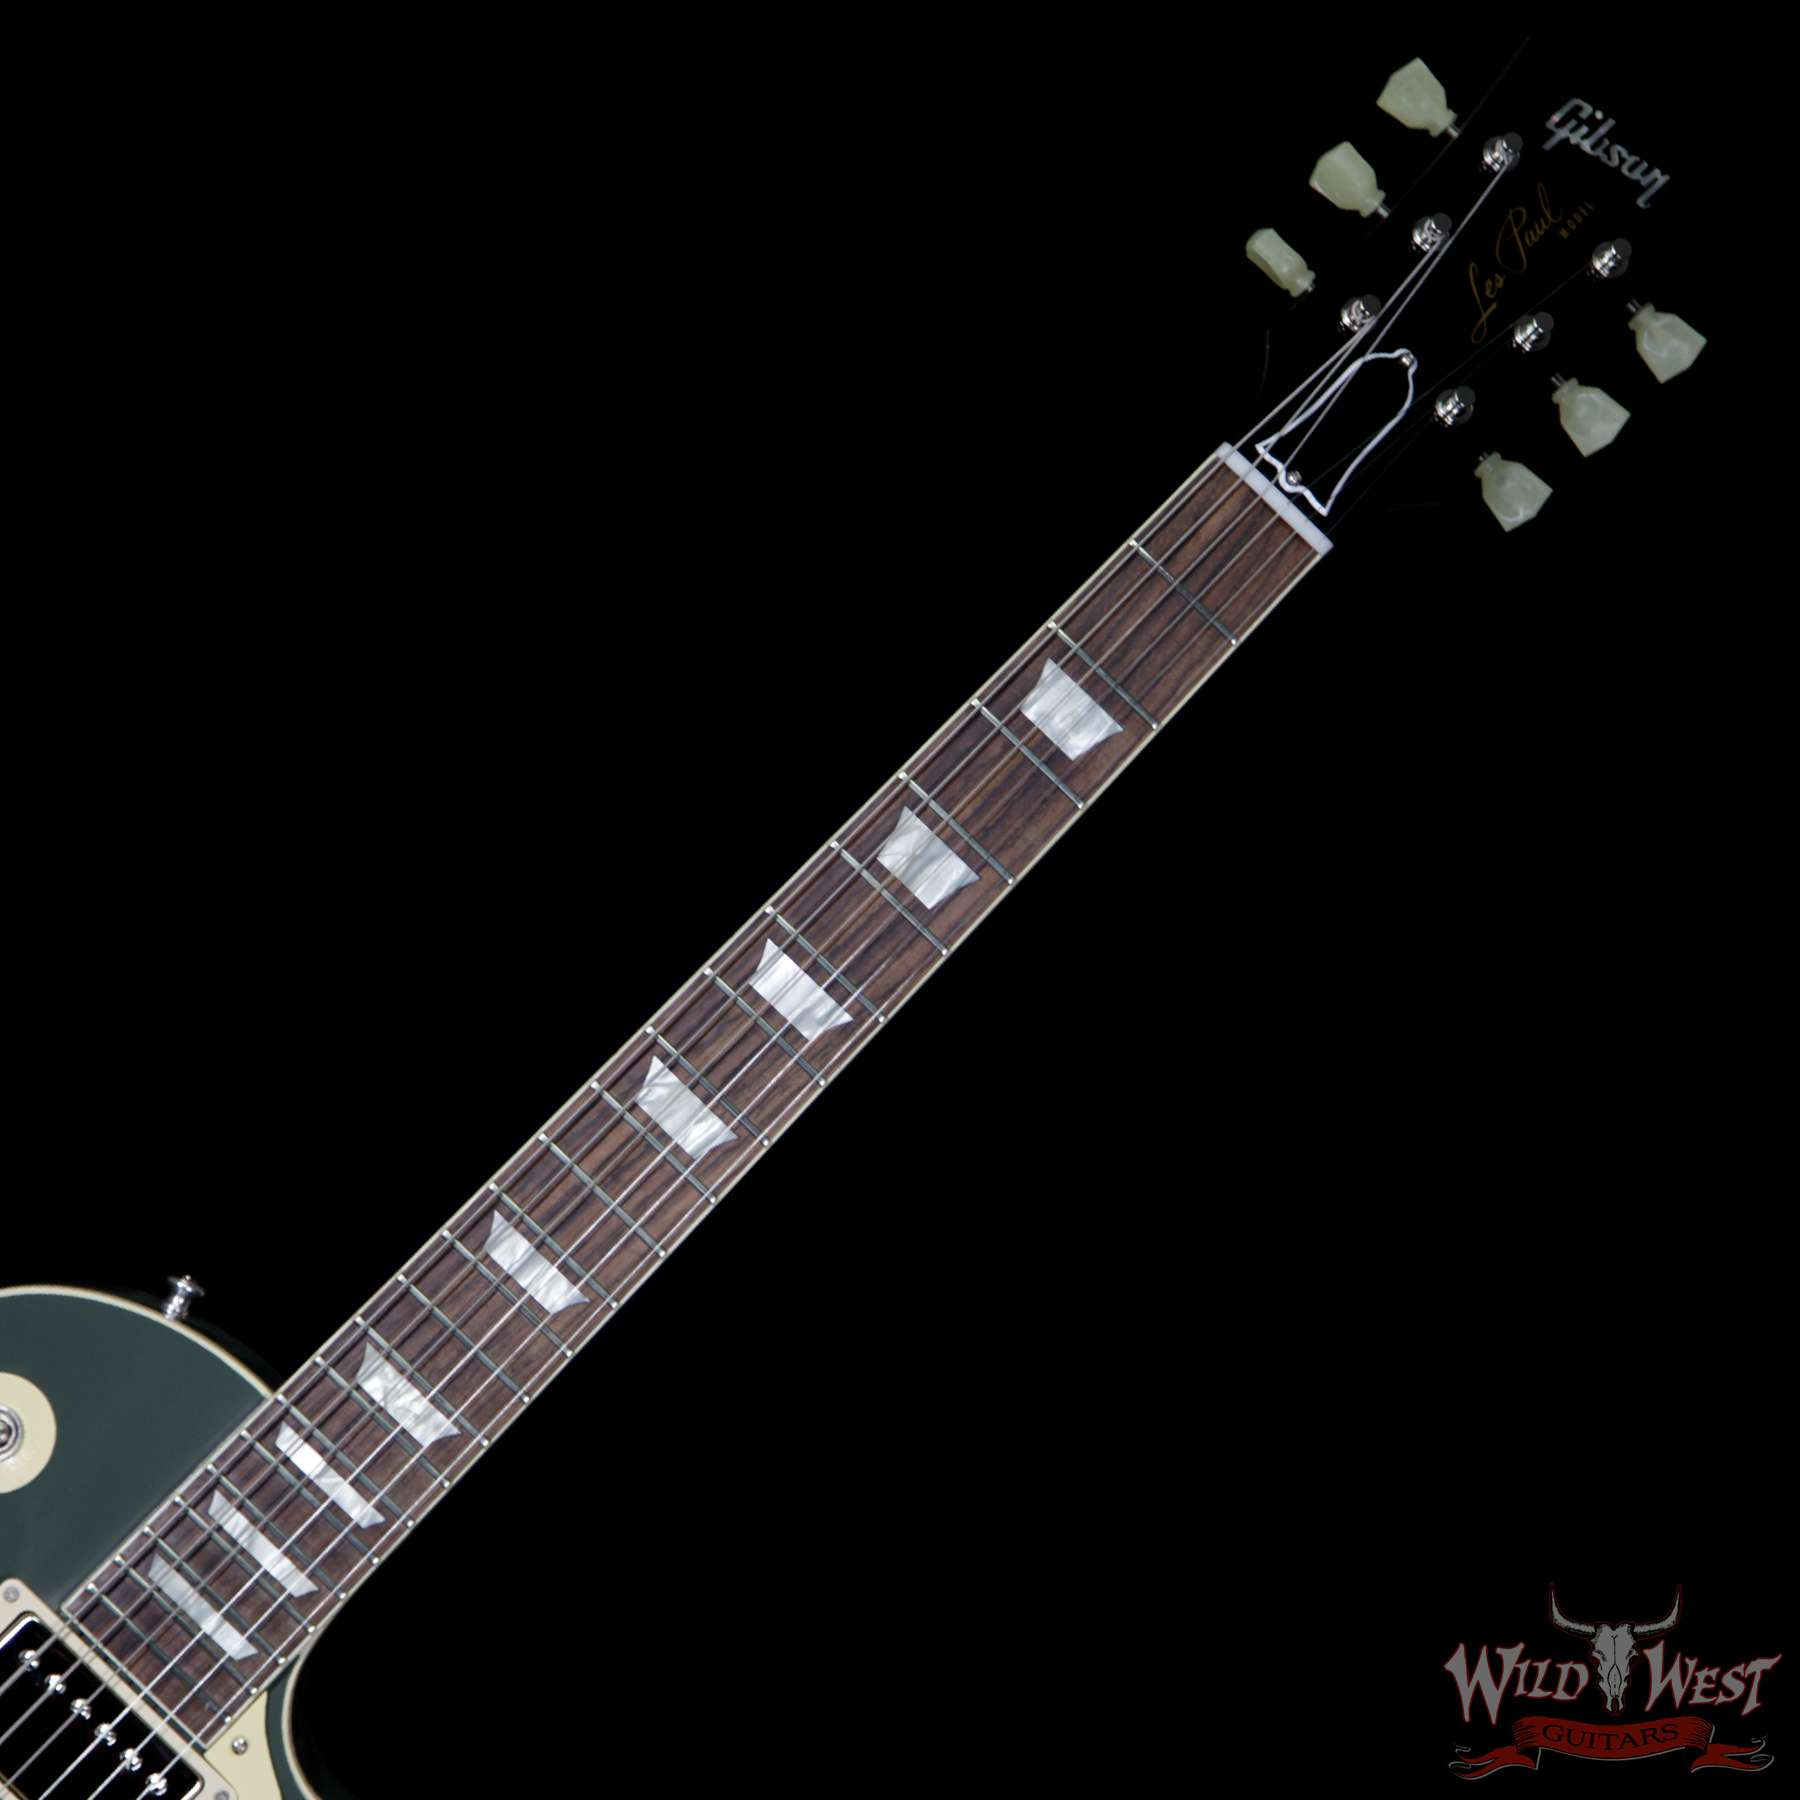 Gibson Custom Shop Les Paul Standard Oxford Grey 8 40 Pounds